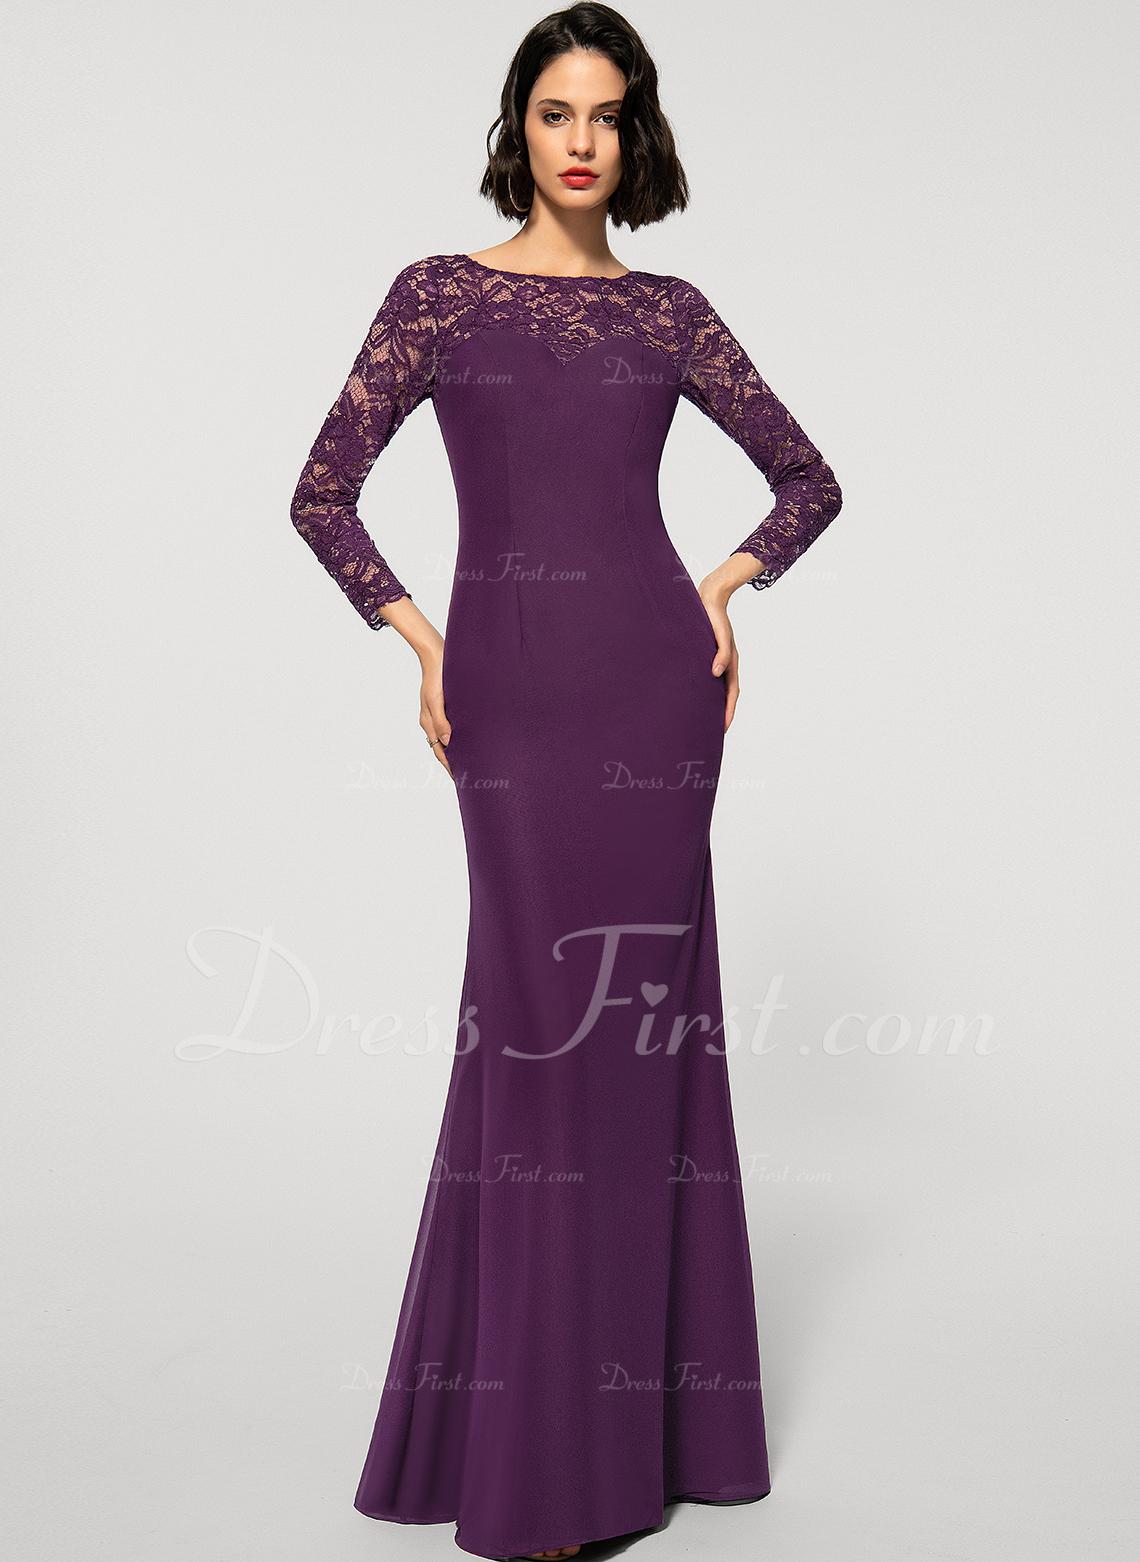 Trumpet/Mermaid Scoop Neck Floor-Length Chiffon Lace Evening Dress